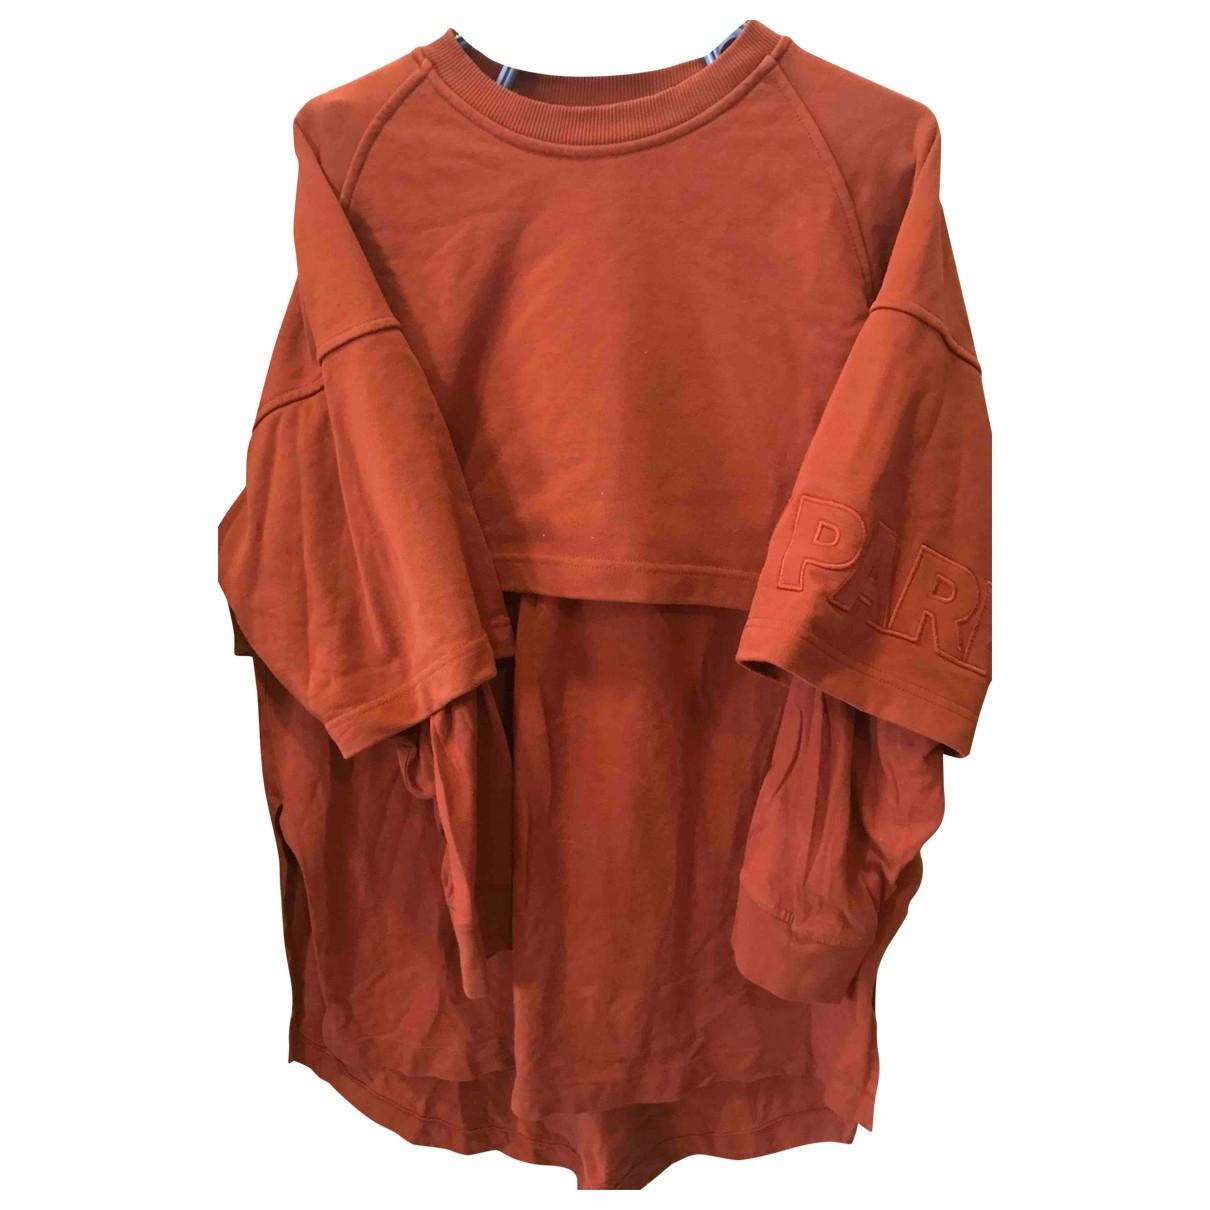 Ivy Park \N Orange Cotton  top for Women 14-16 US